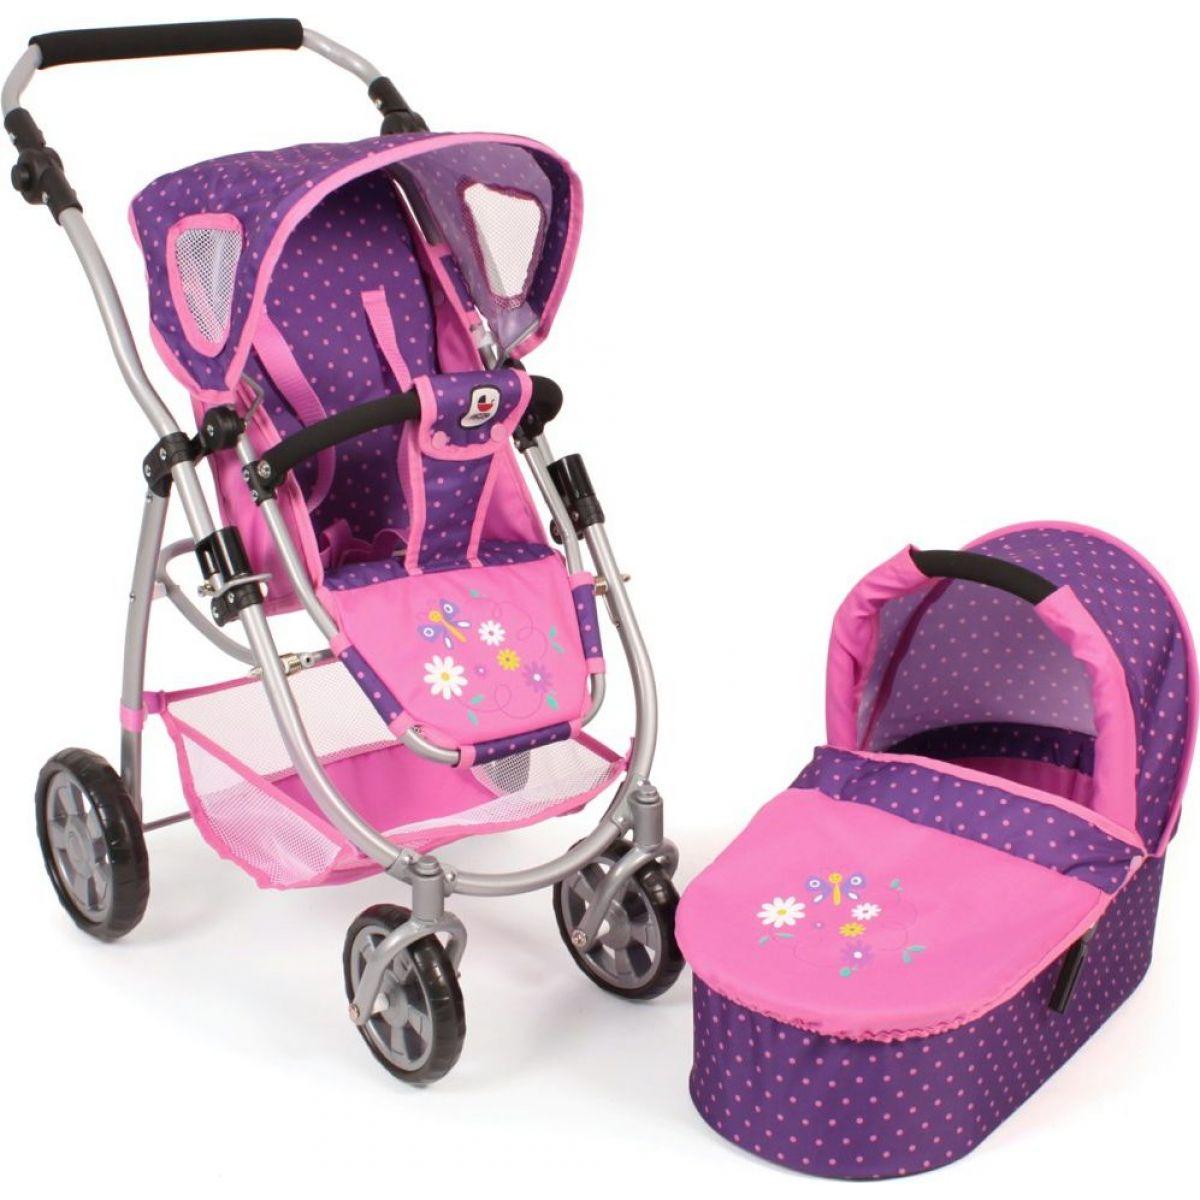 Bayer Chic EMOTION 2v1 Dots purple pink